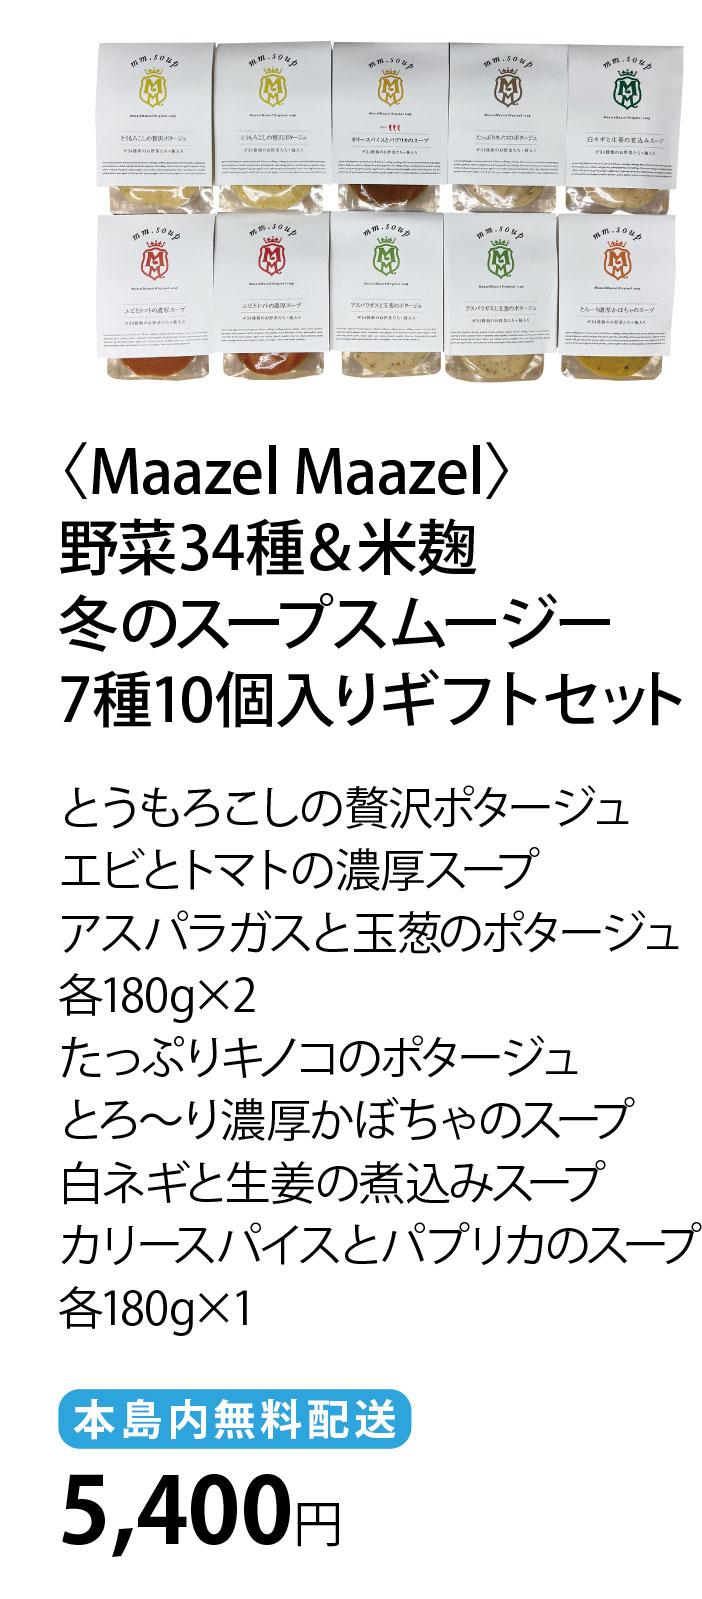 <Maazel Maazel>野菜34種&米麹 冬のスープスムージー7種10個入りギフトセット